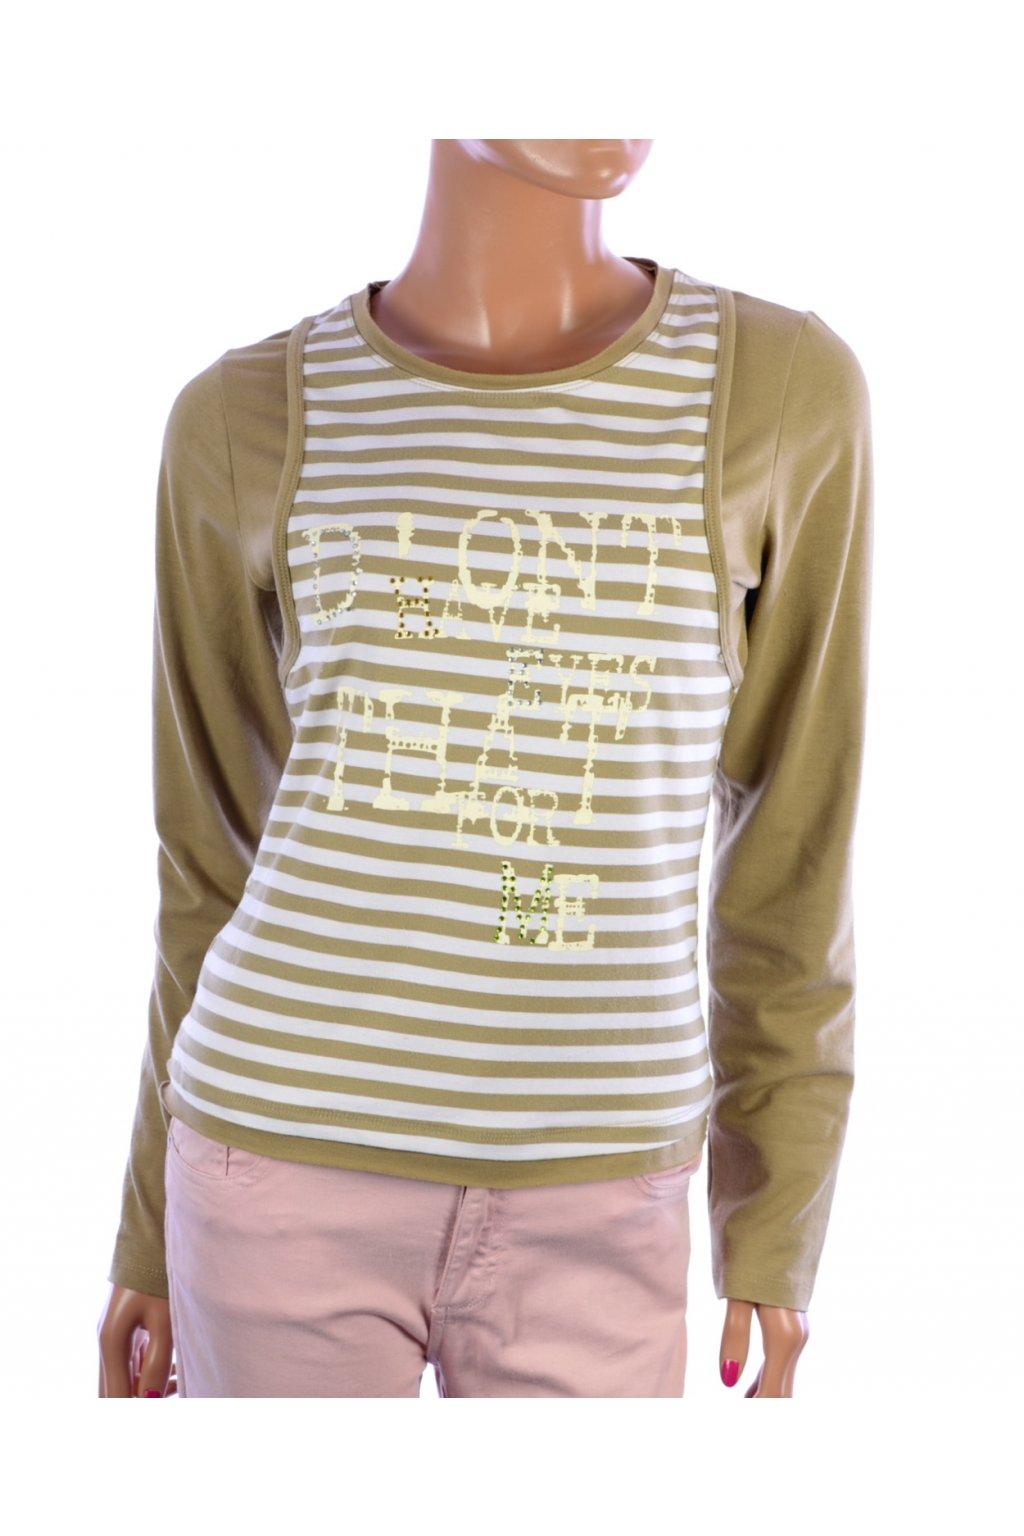 Tričko Aldinova vel S/M hnědo bílé pruhované